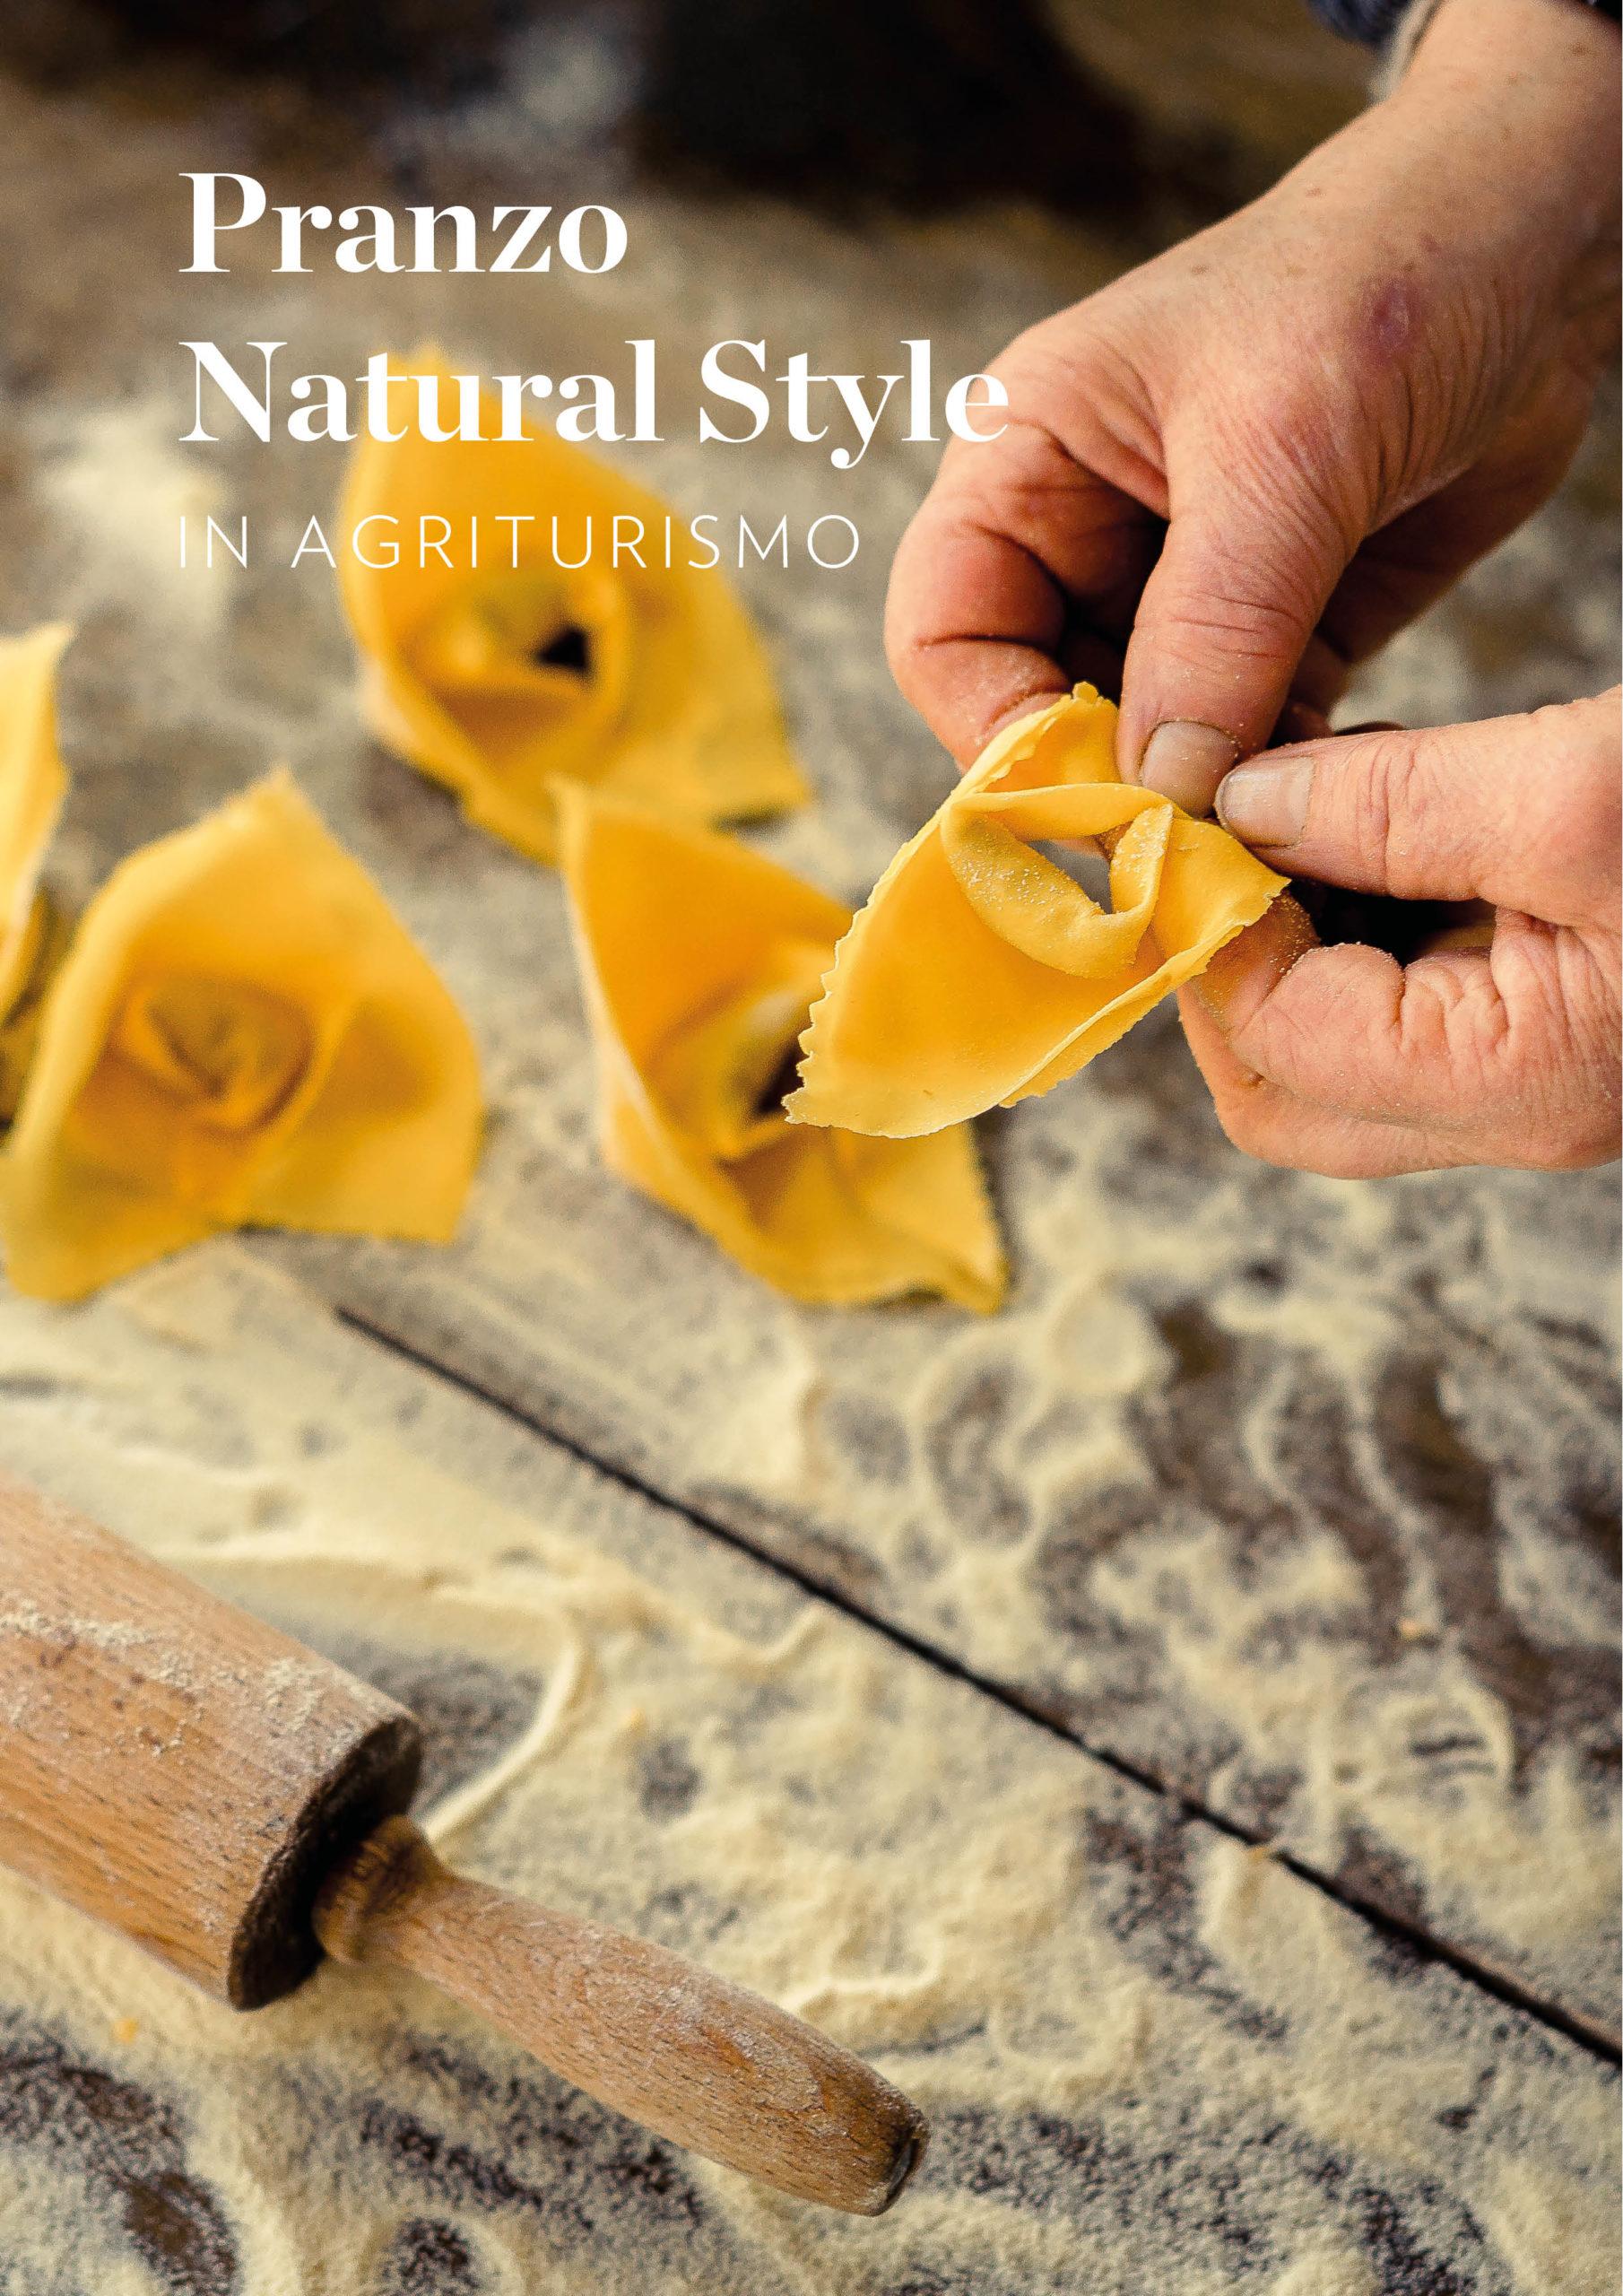 Pranzo Natural Style